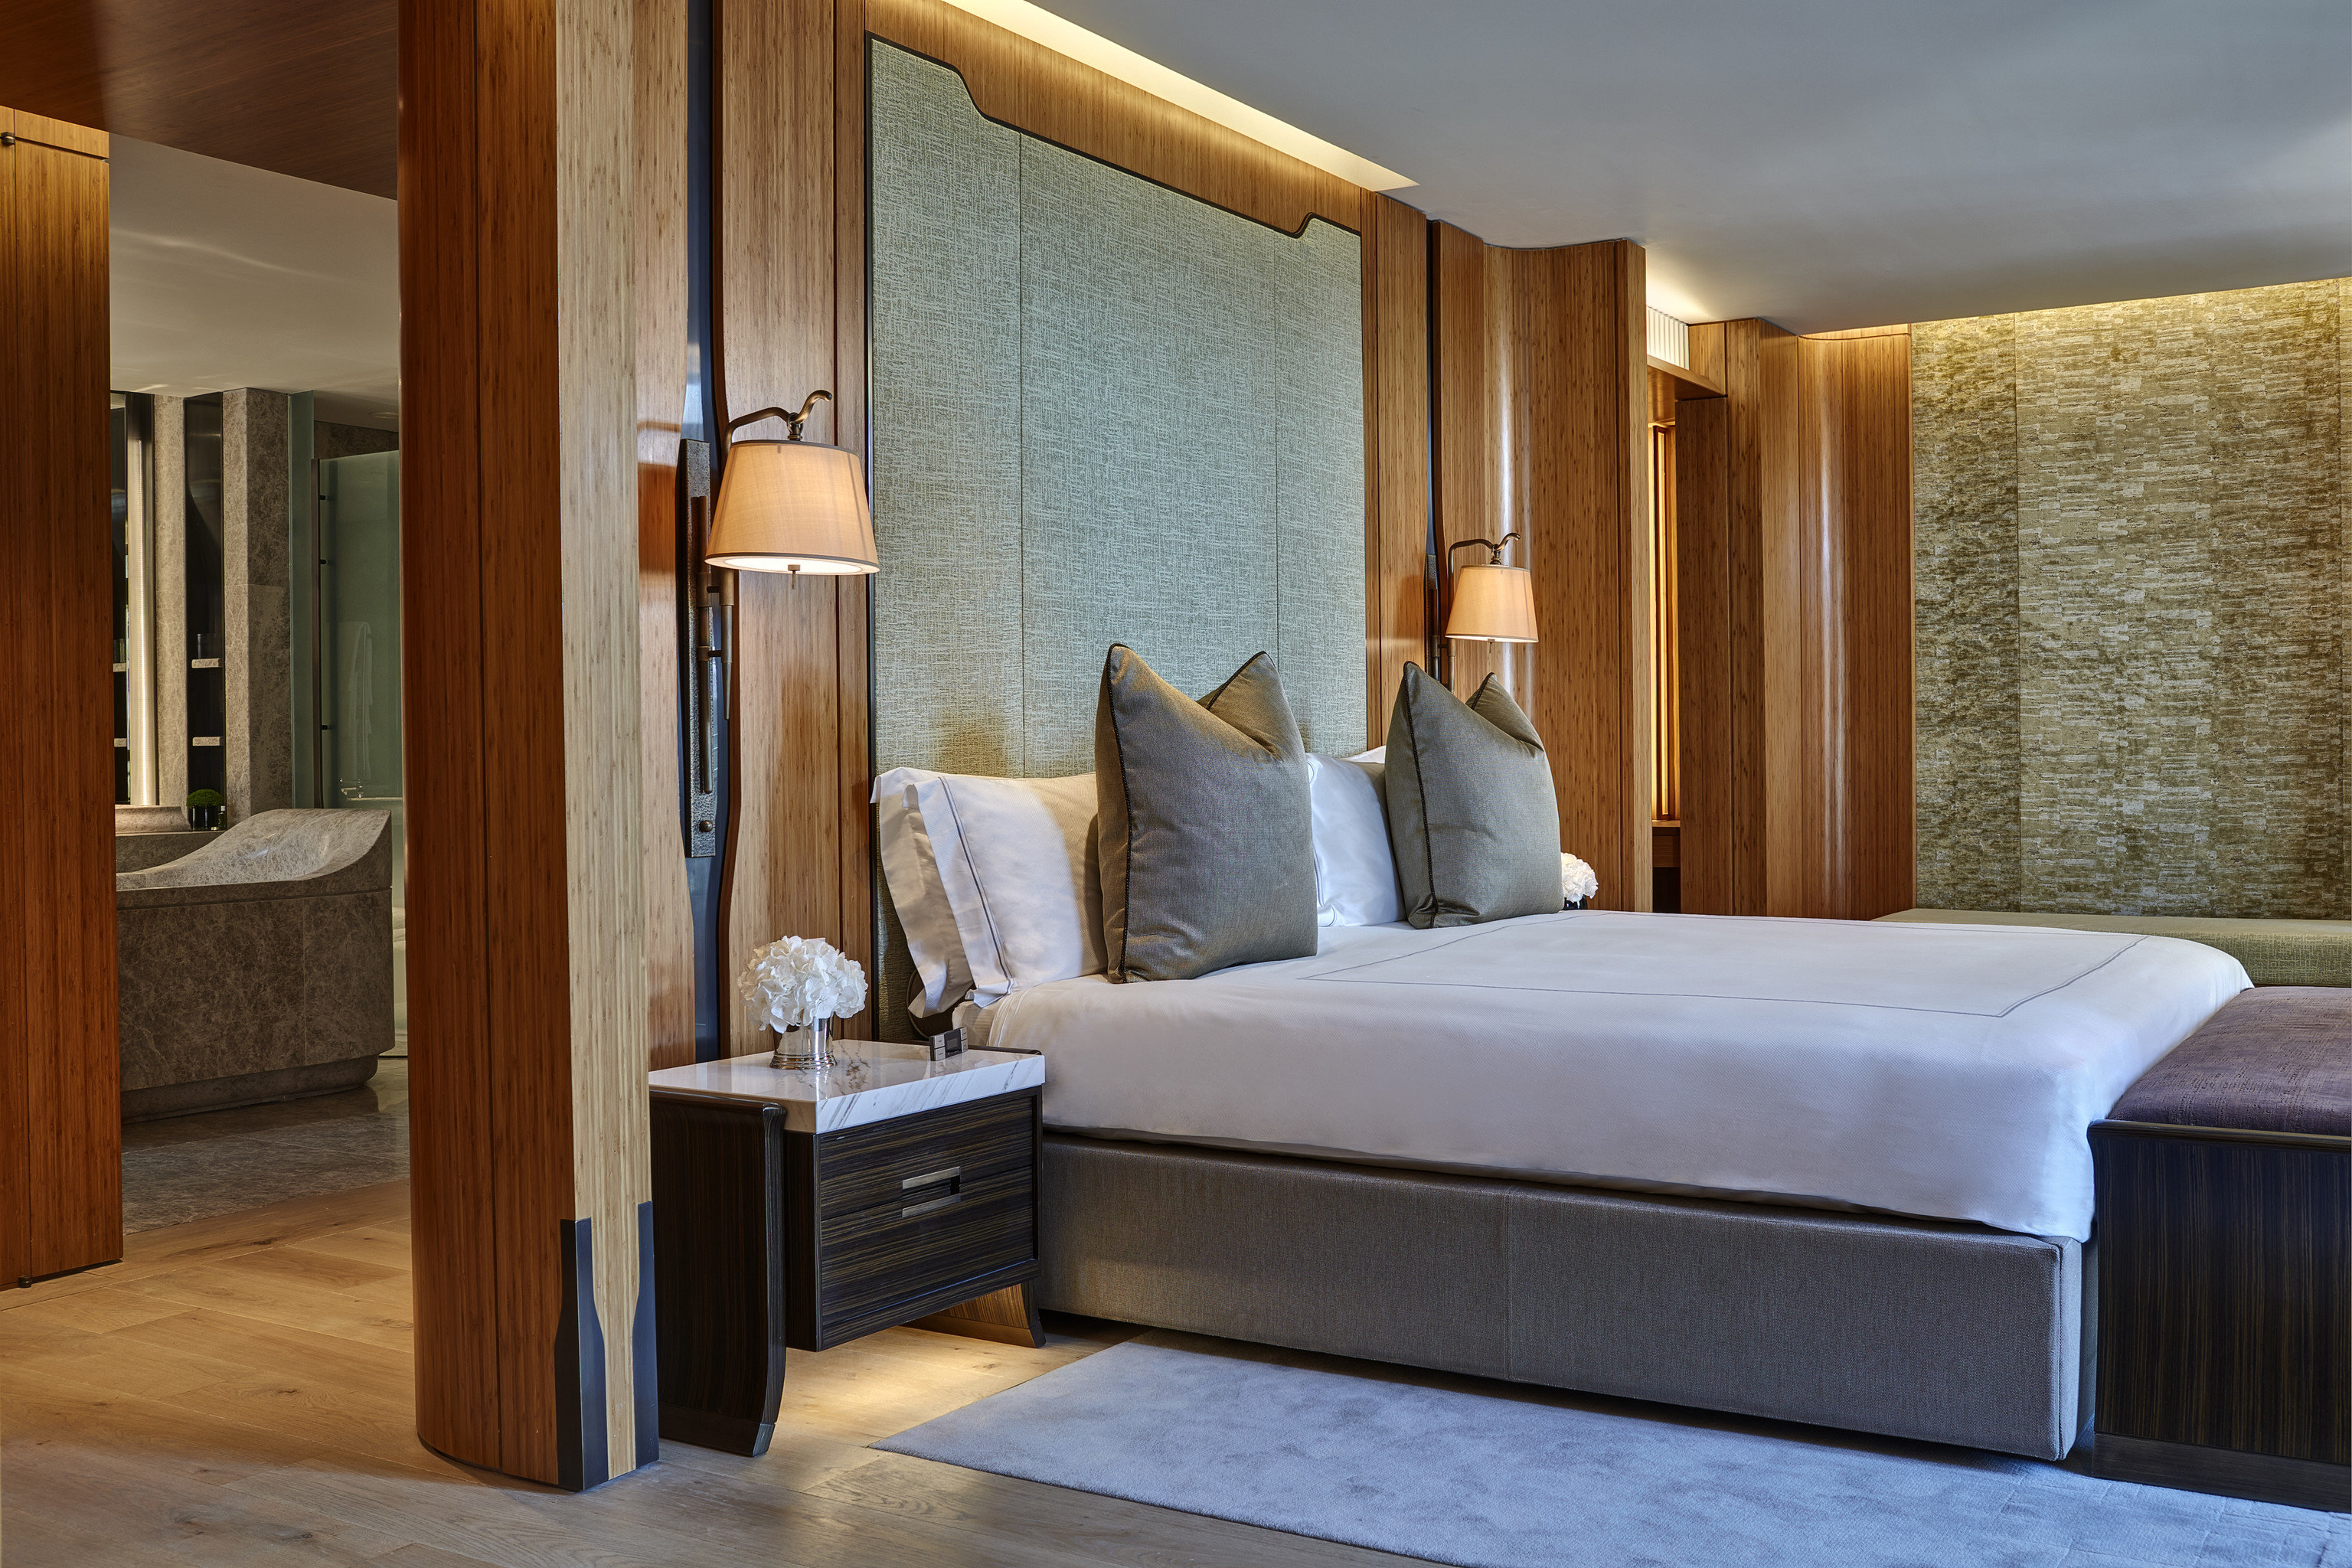 Hotels Luxury Travel indoor floor bed wall room bed frame Suite interior design Bedroom furniture hotel ceiling wood mattress interior designer bed sheet